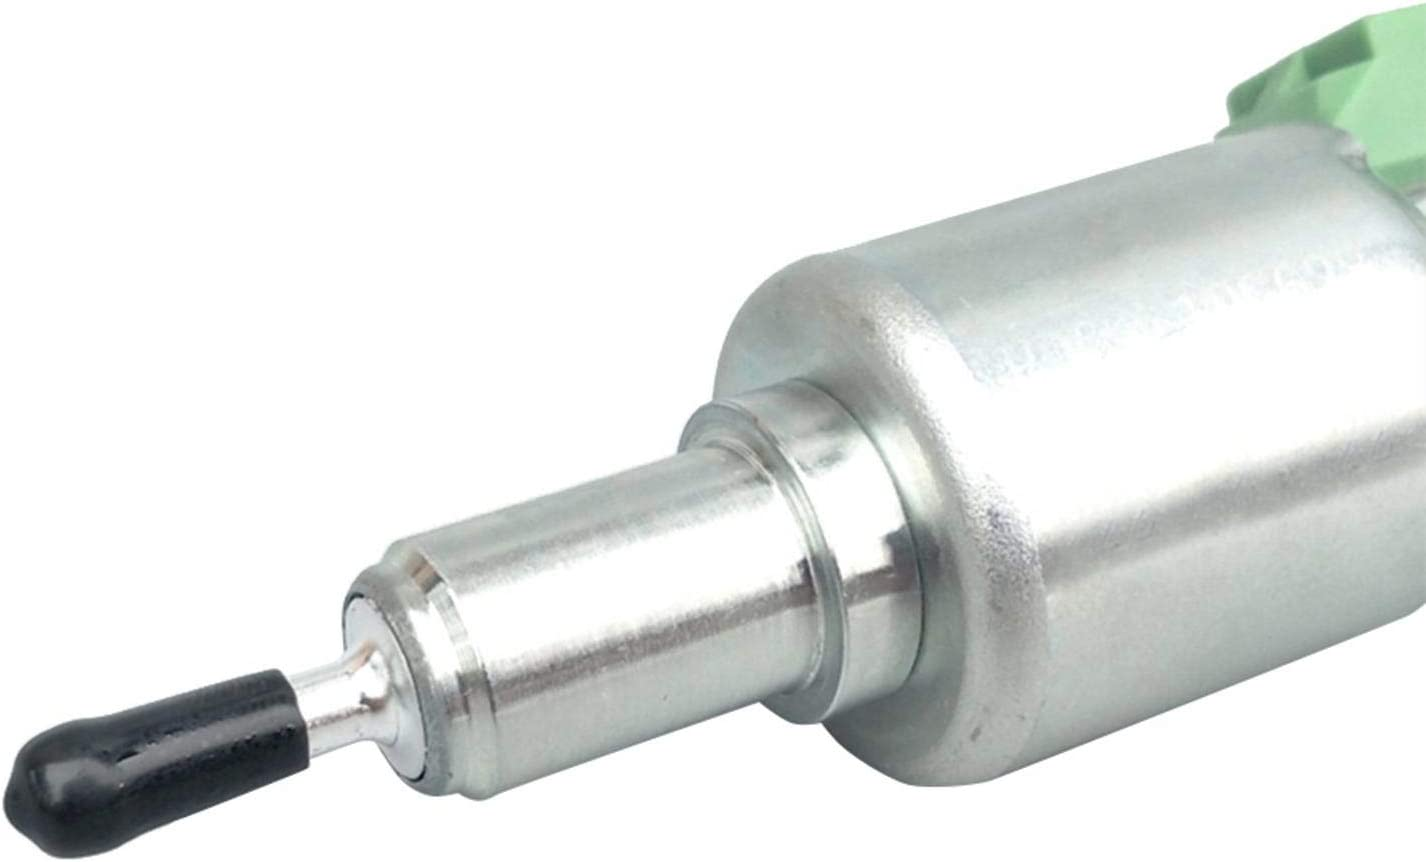 bomba de medici/ón de pulso. bomba de gasolina//bomba di/ésel//m/áquina de construcci/ón el/éctrica ahorro de combustible bomba de aparcamiento para coche N//Z Bomba de calefacci/ón universal de 12 V//24 V